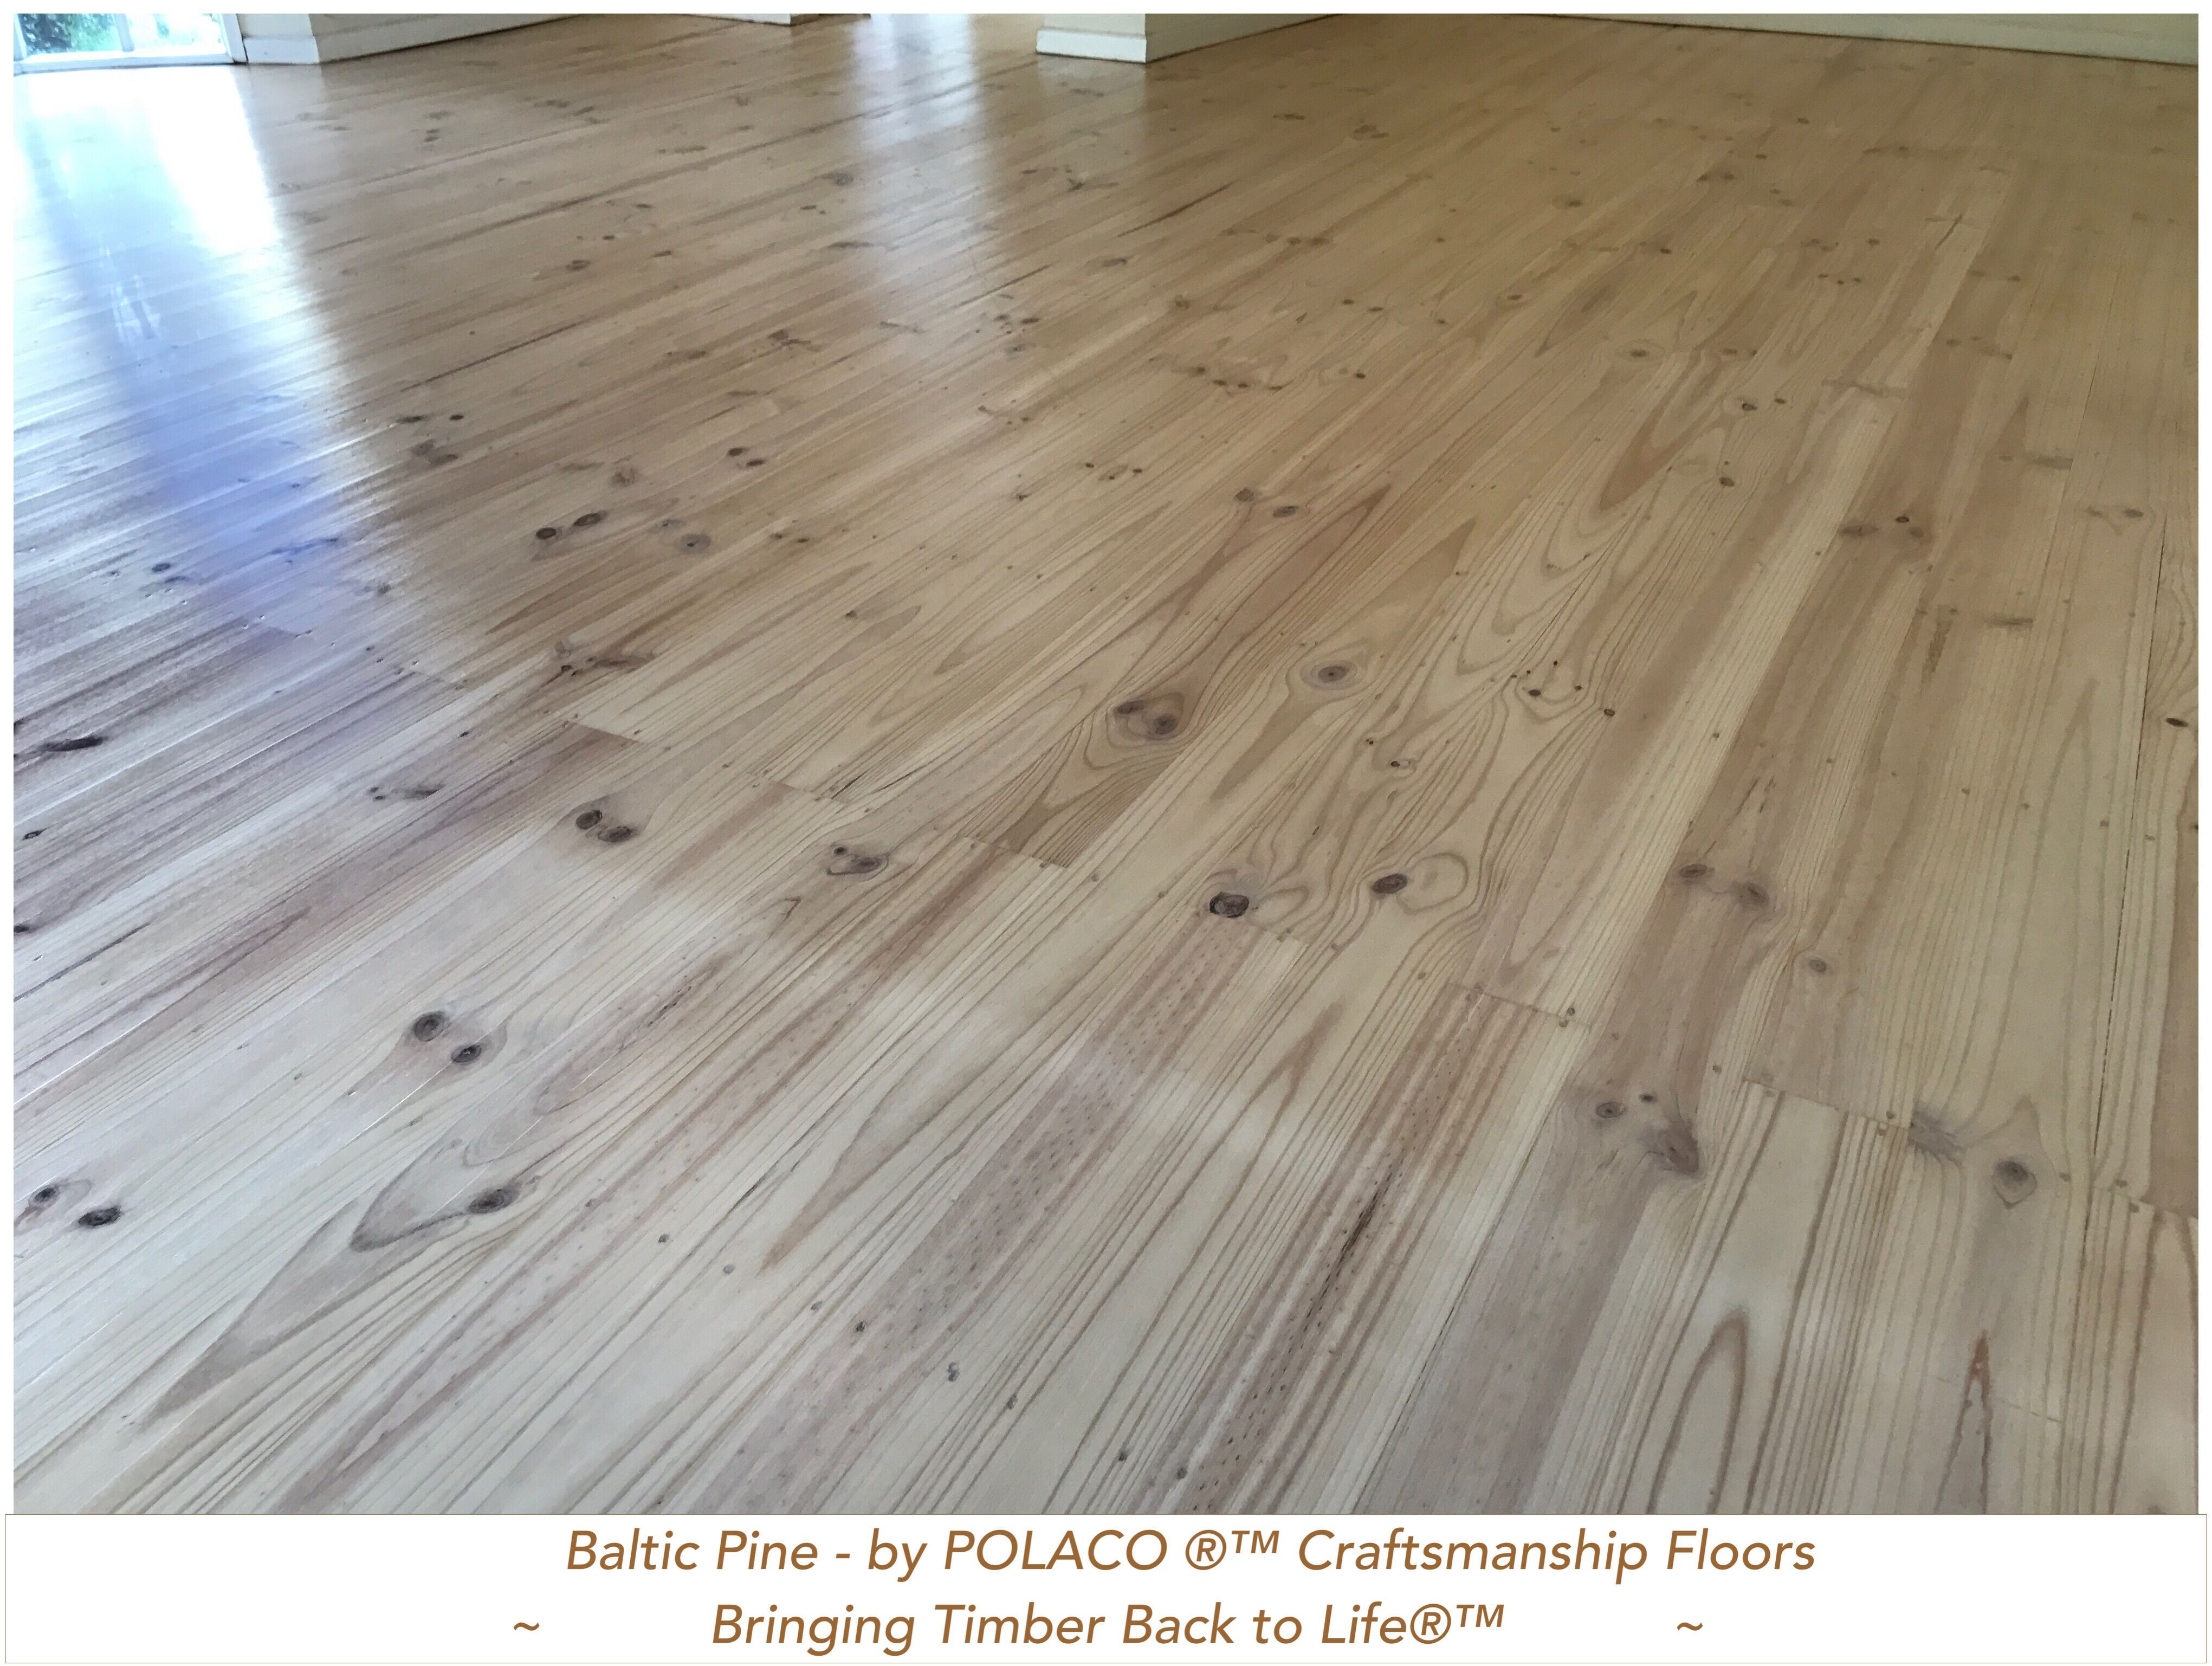 oak hardwood flooring seattle of sanding hardwood floors floor plan ideas within sanding hardwood floors baltic pine floorboards baltic pine baltic pine floor